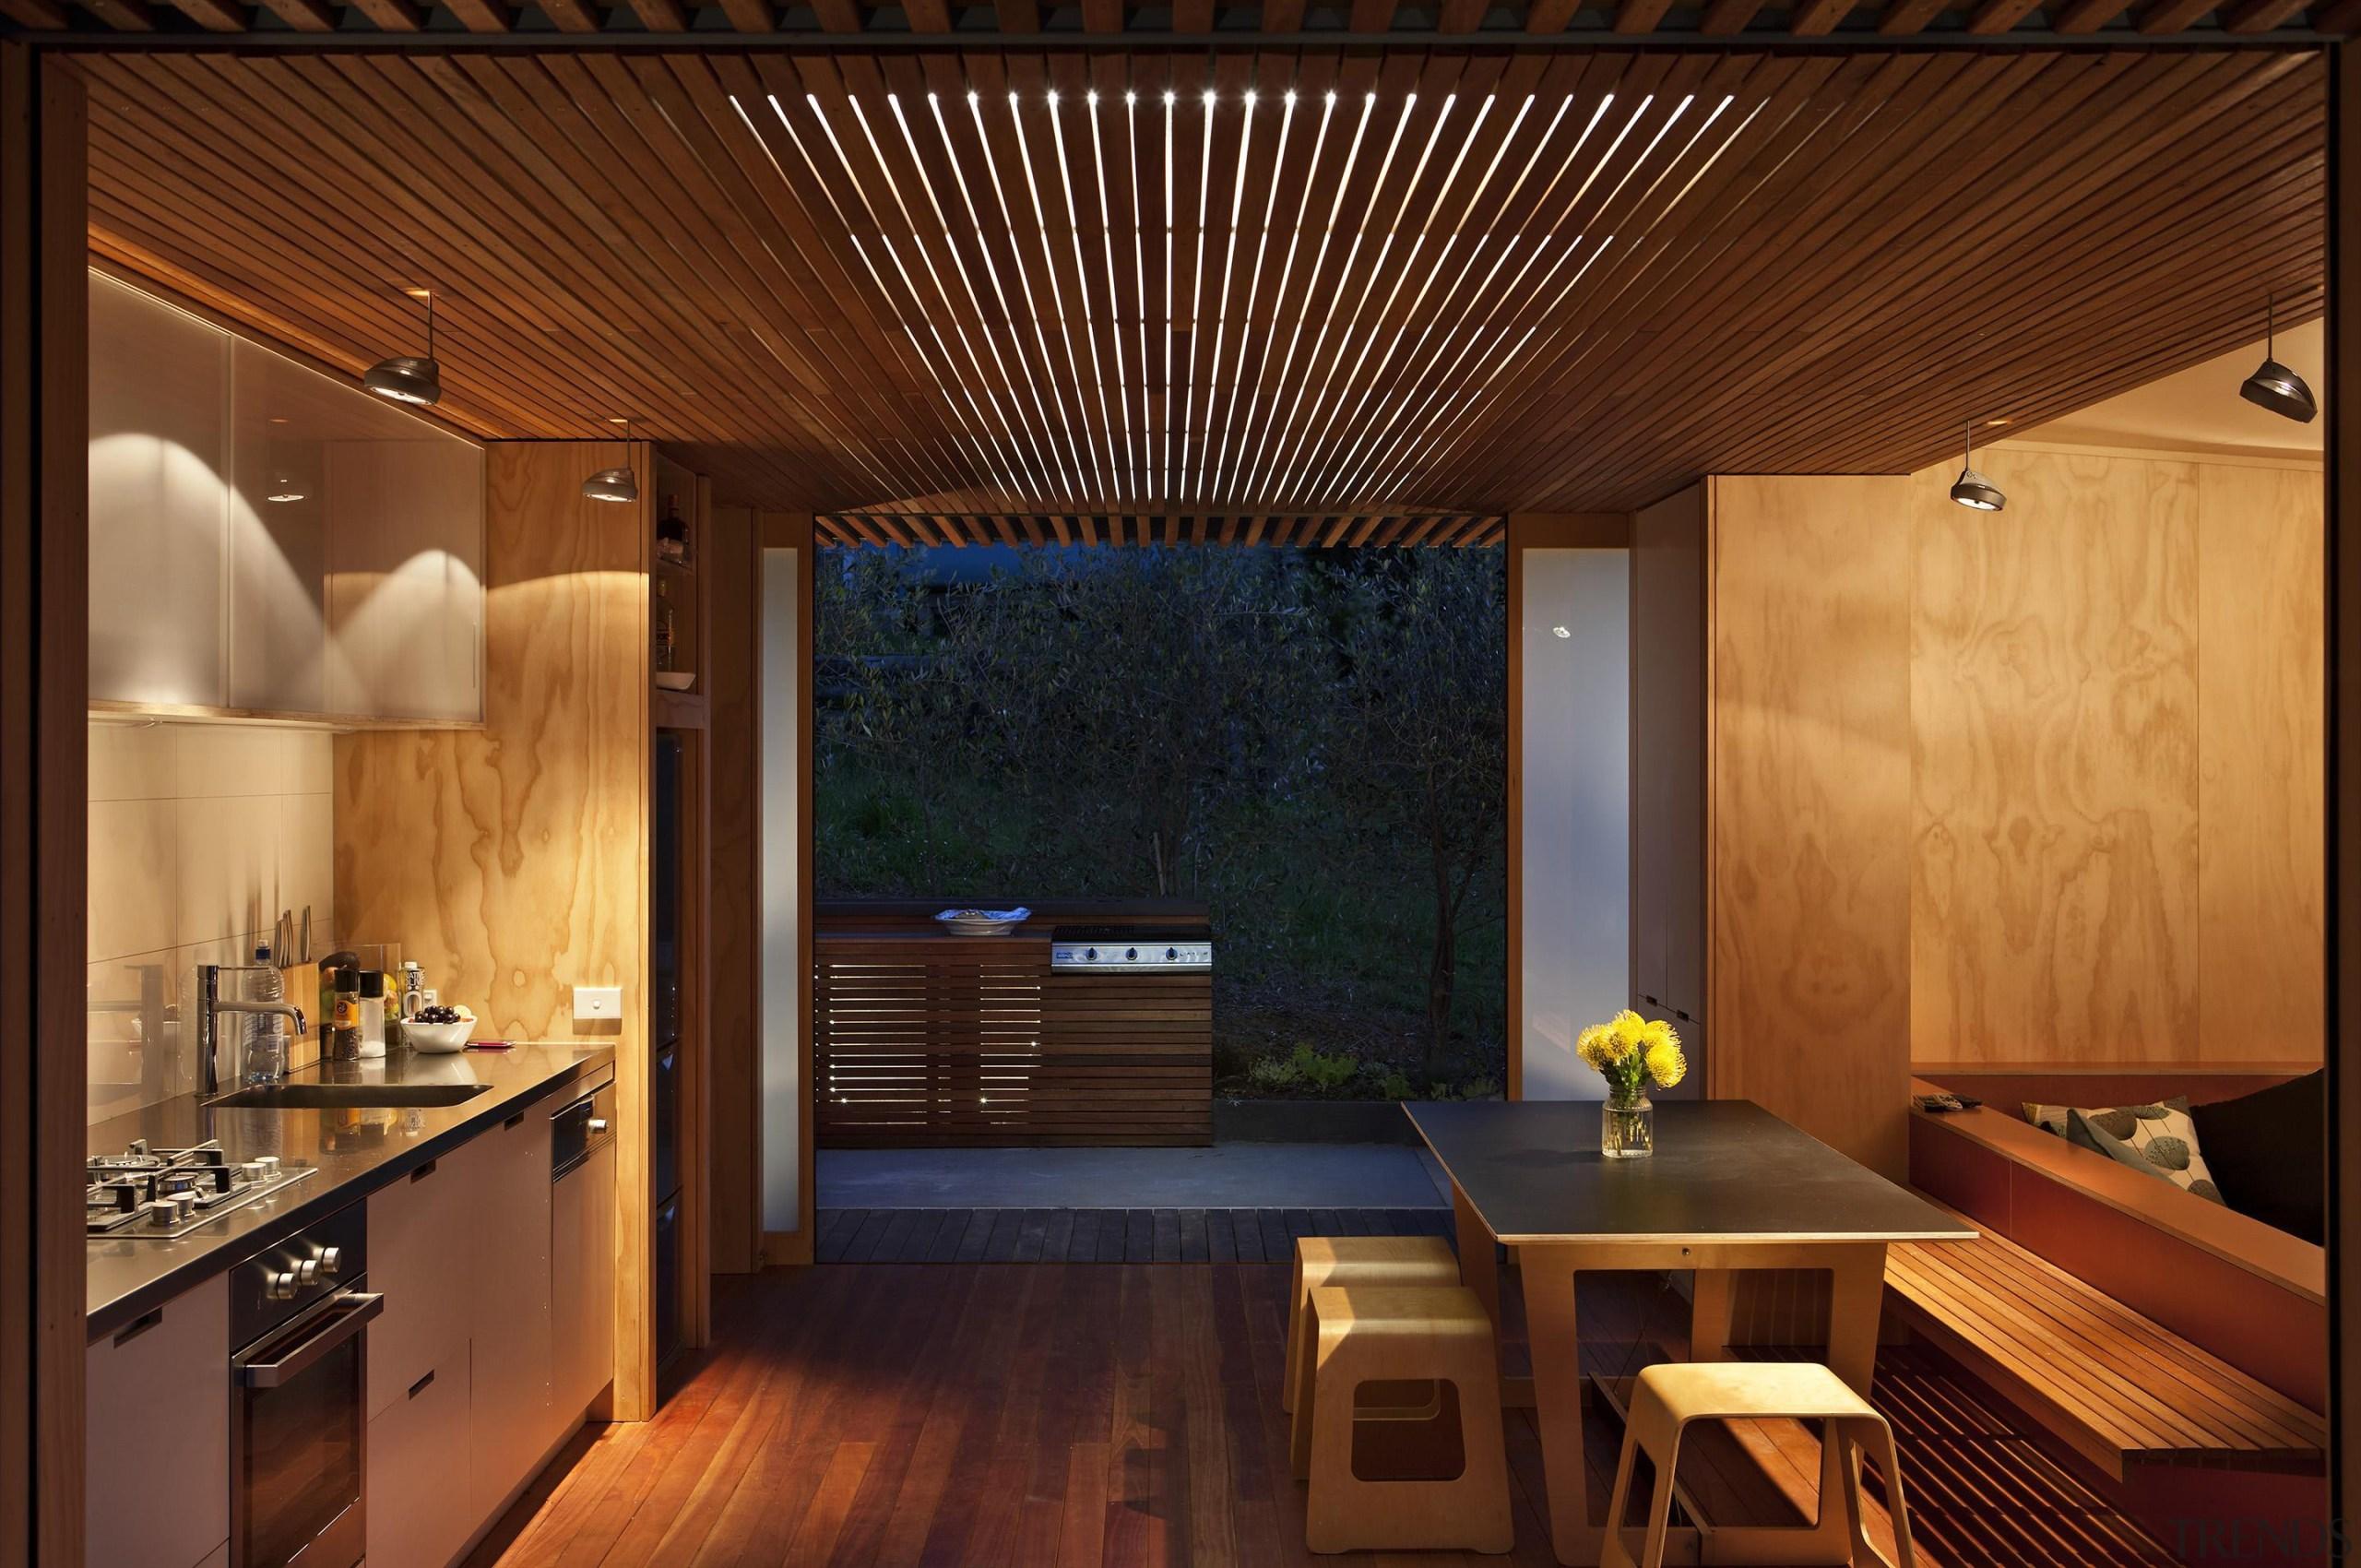 Coromandel, New Zealand - Studio 19 Onemana Bach architecture, ceiling, countertop, house, interior design, lighting, real estate, wood, brown